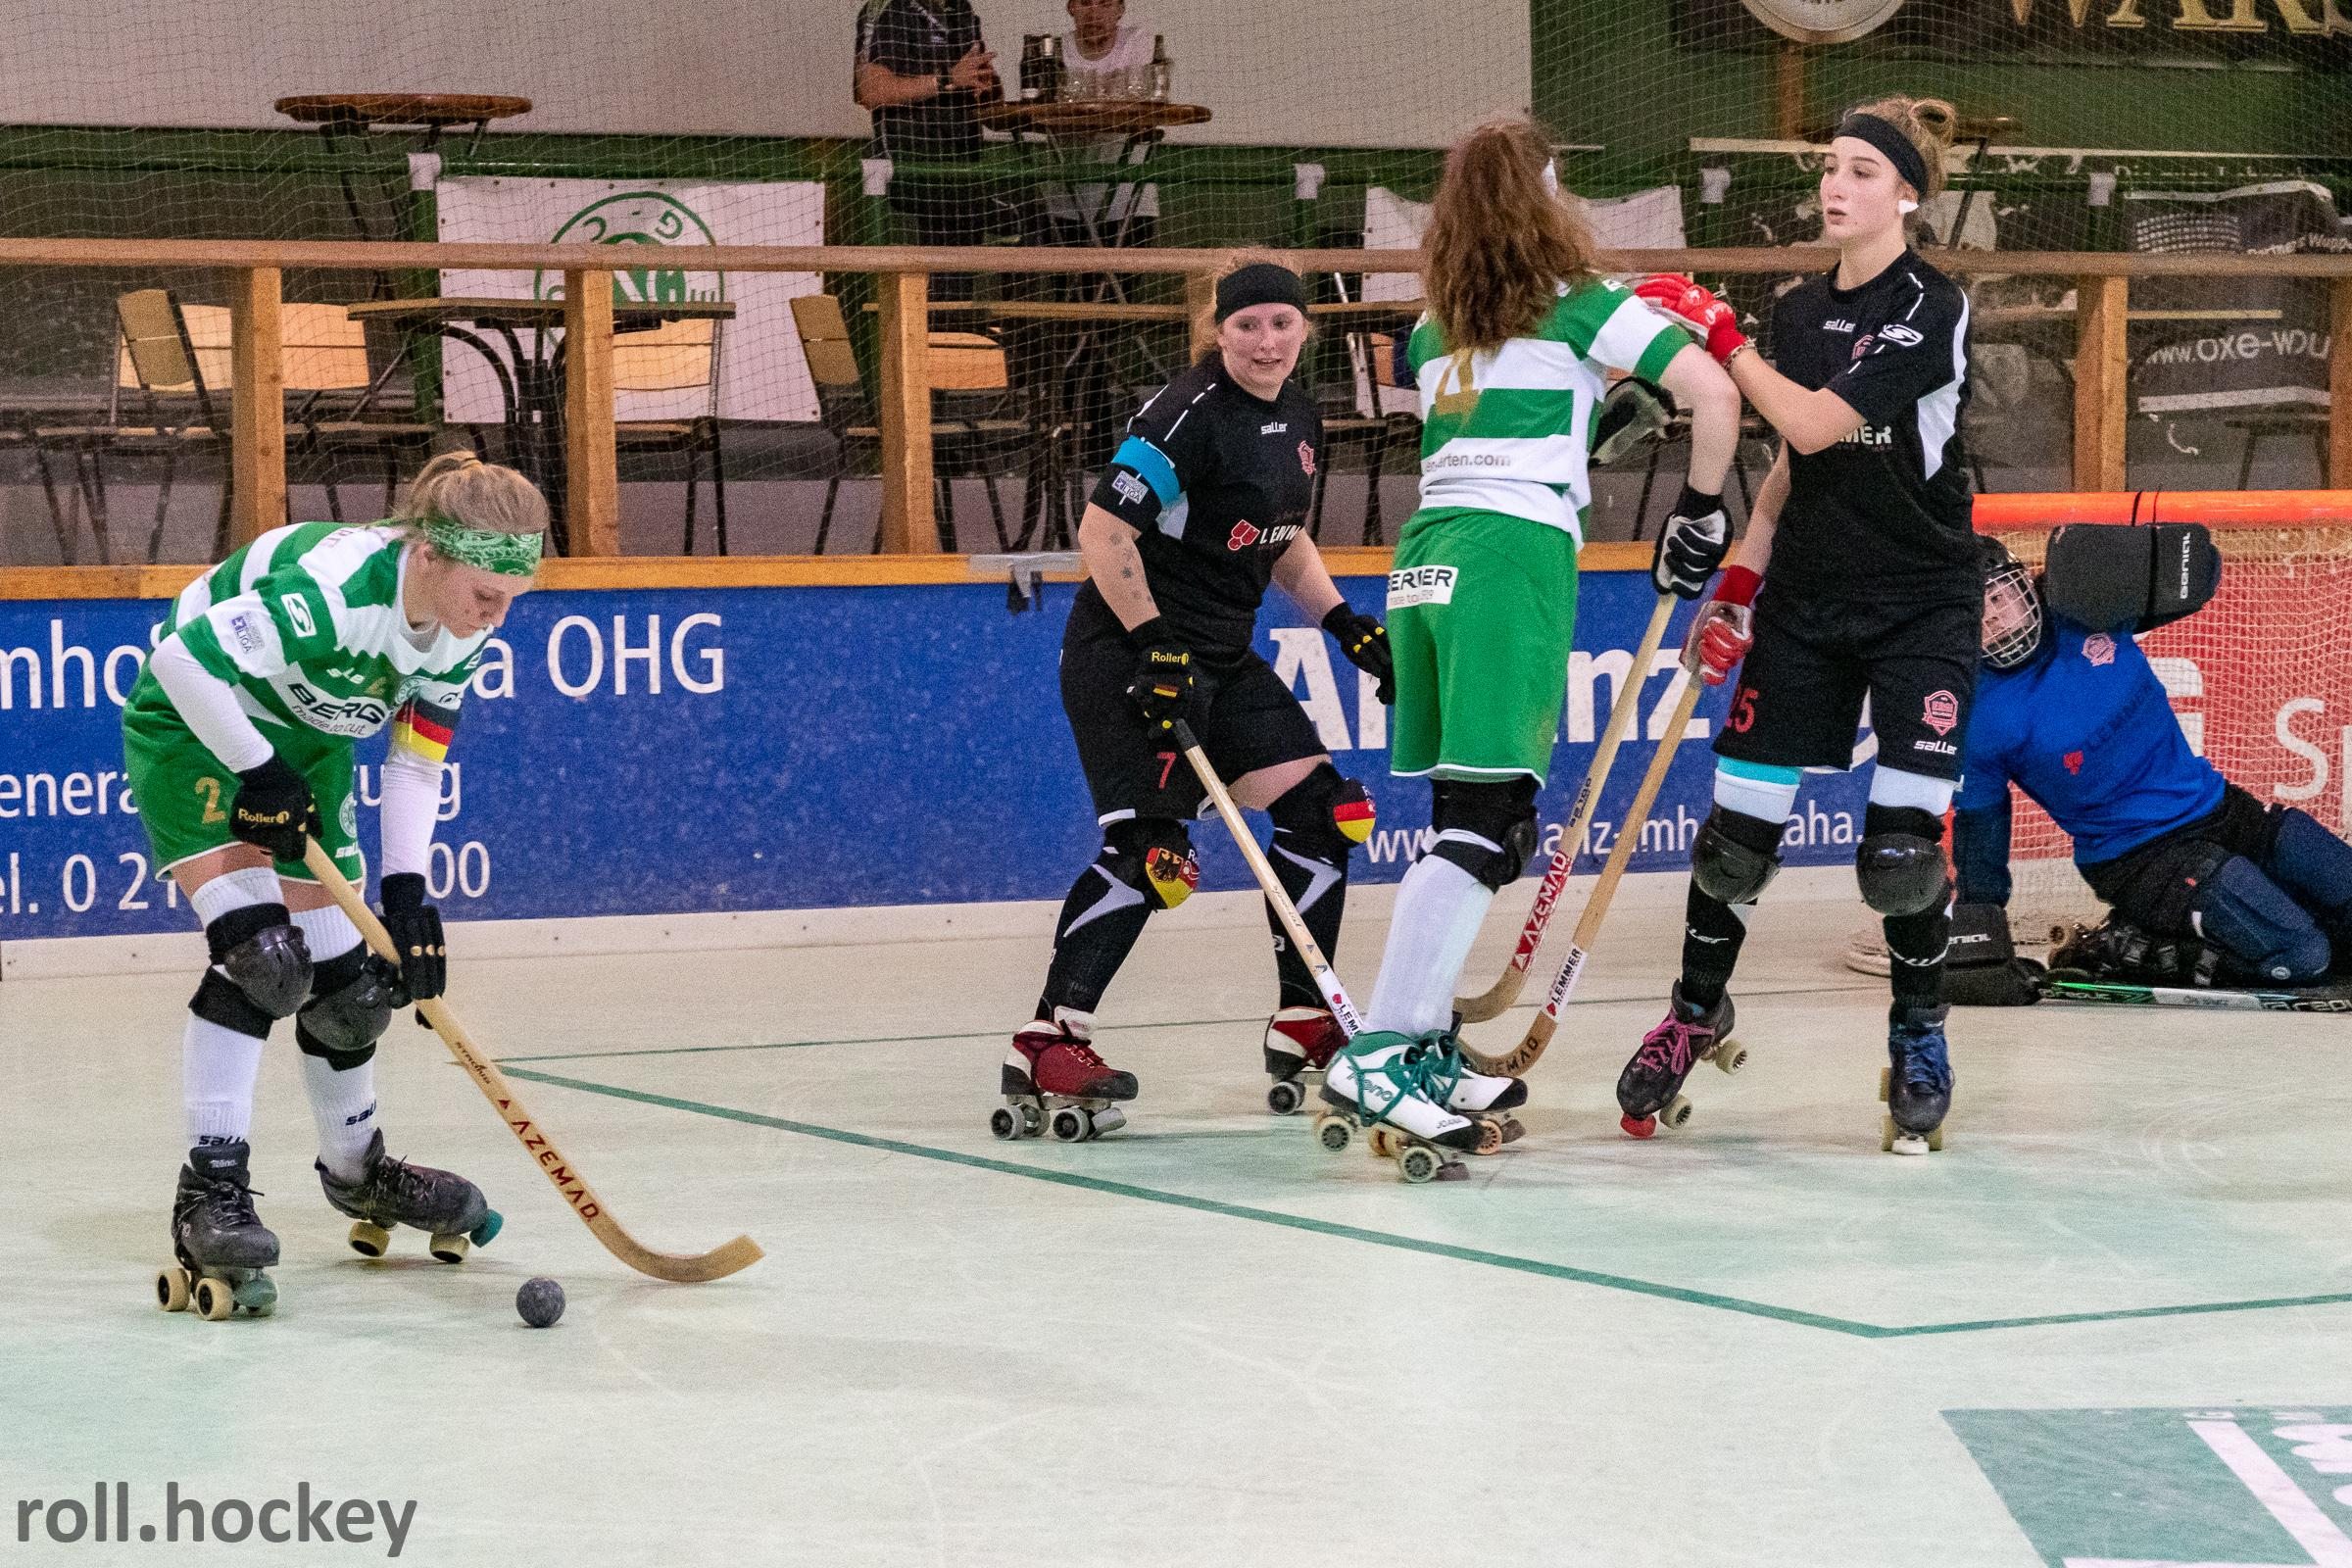 RSC Cronenberg Rollhockey Bundesliga Damen Spieltag 23.02.2019